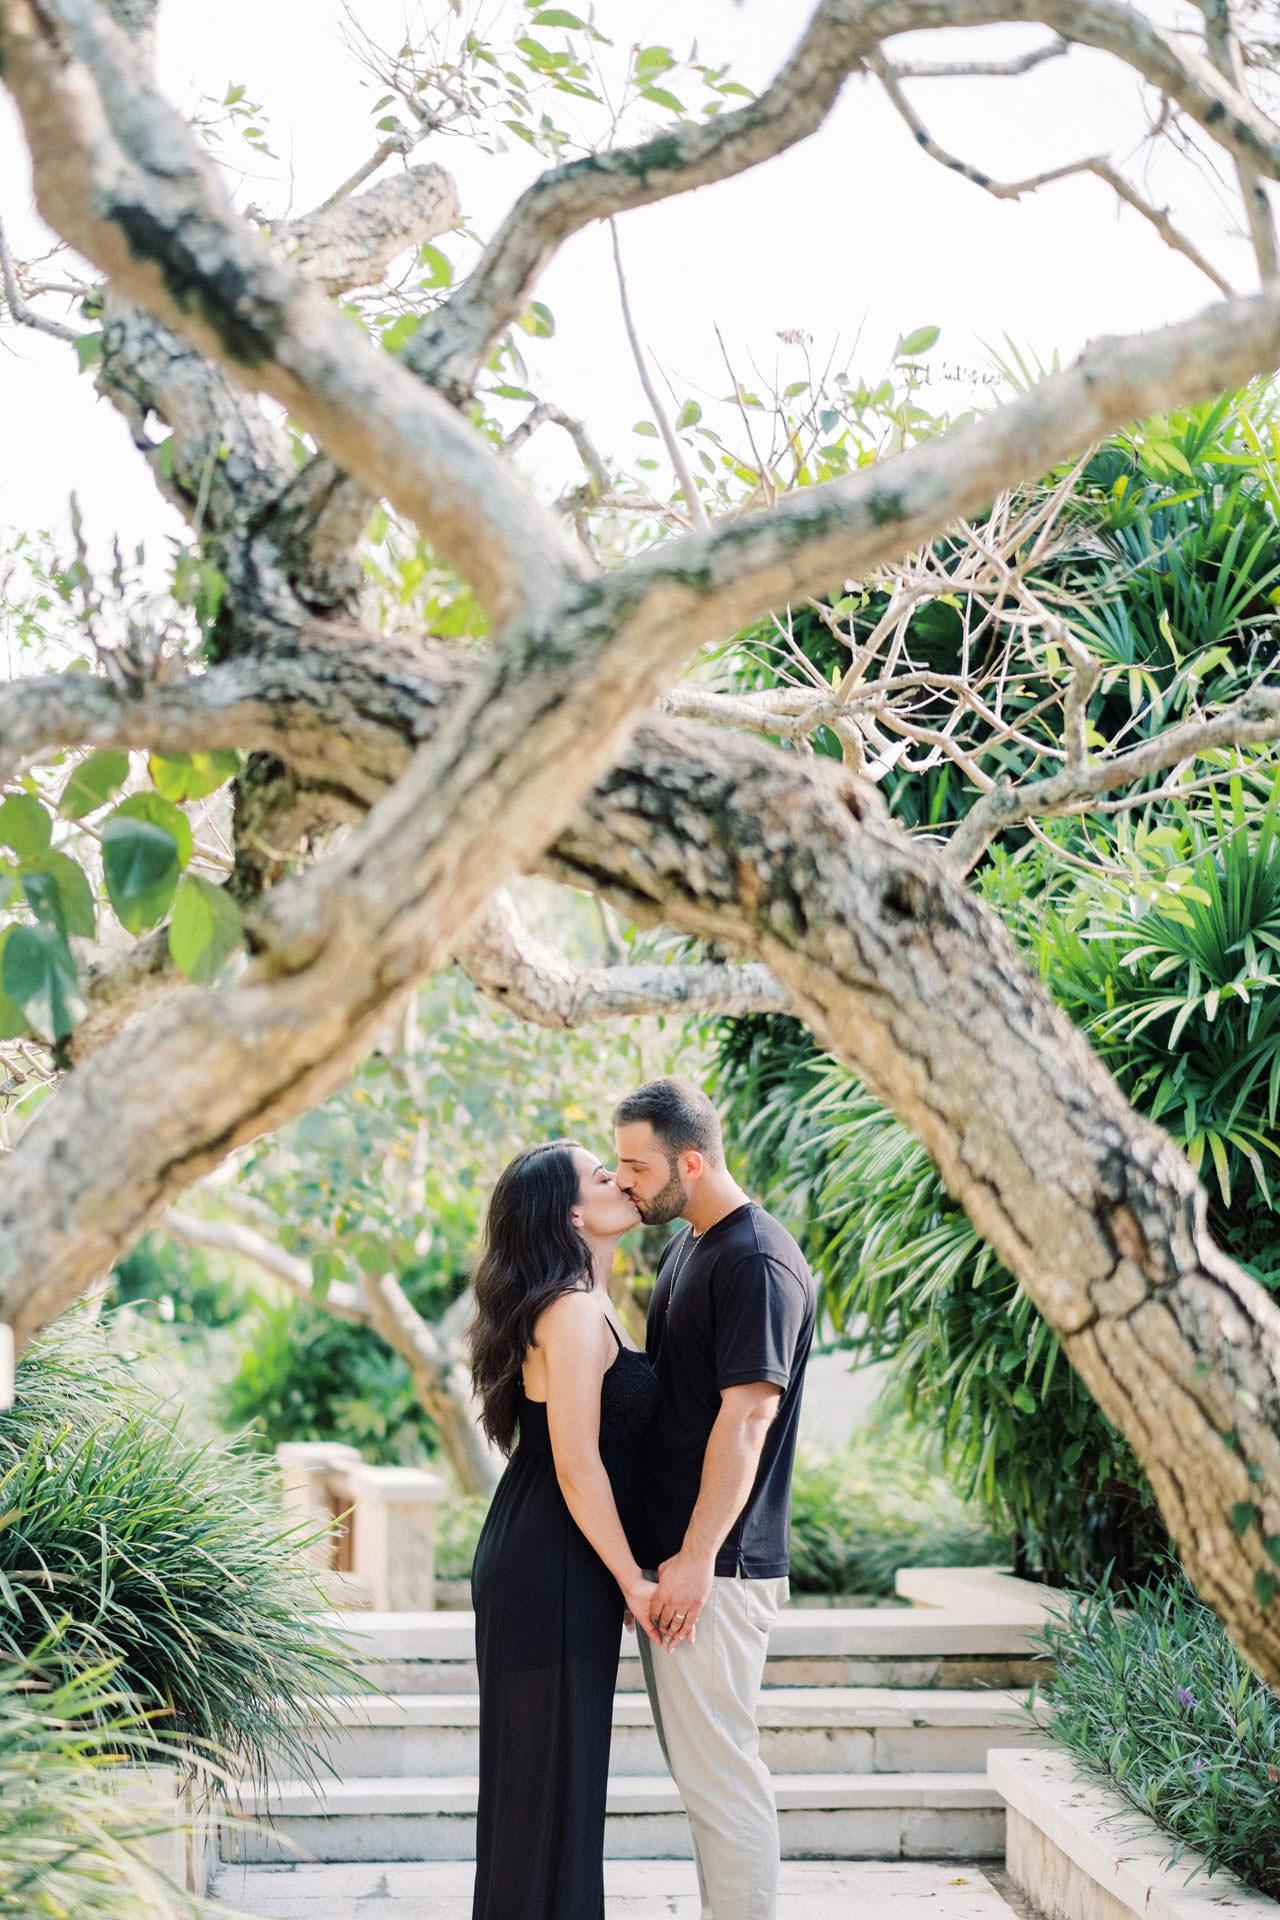 Honeymoon Photo Session at The World's Best Resort 13